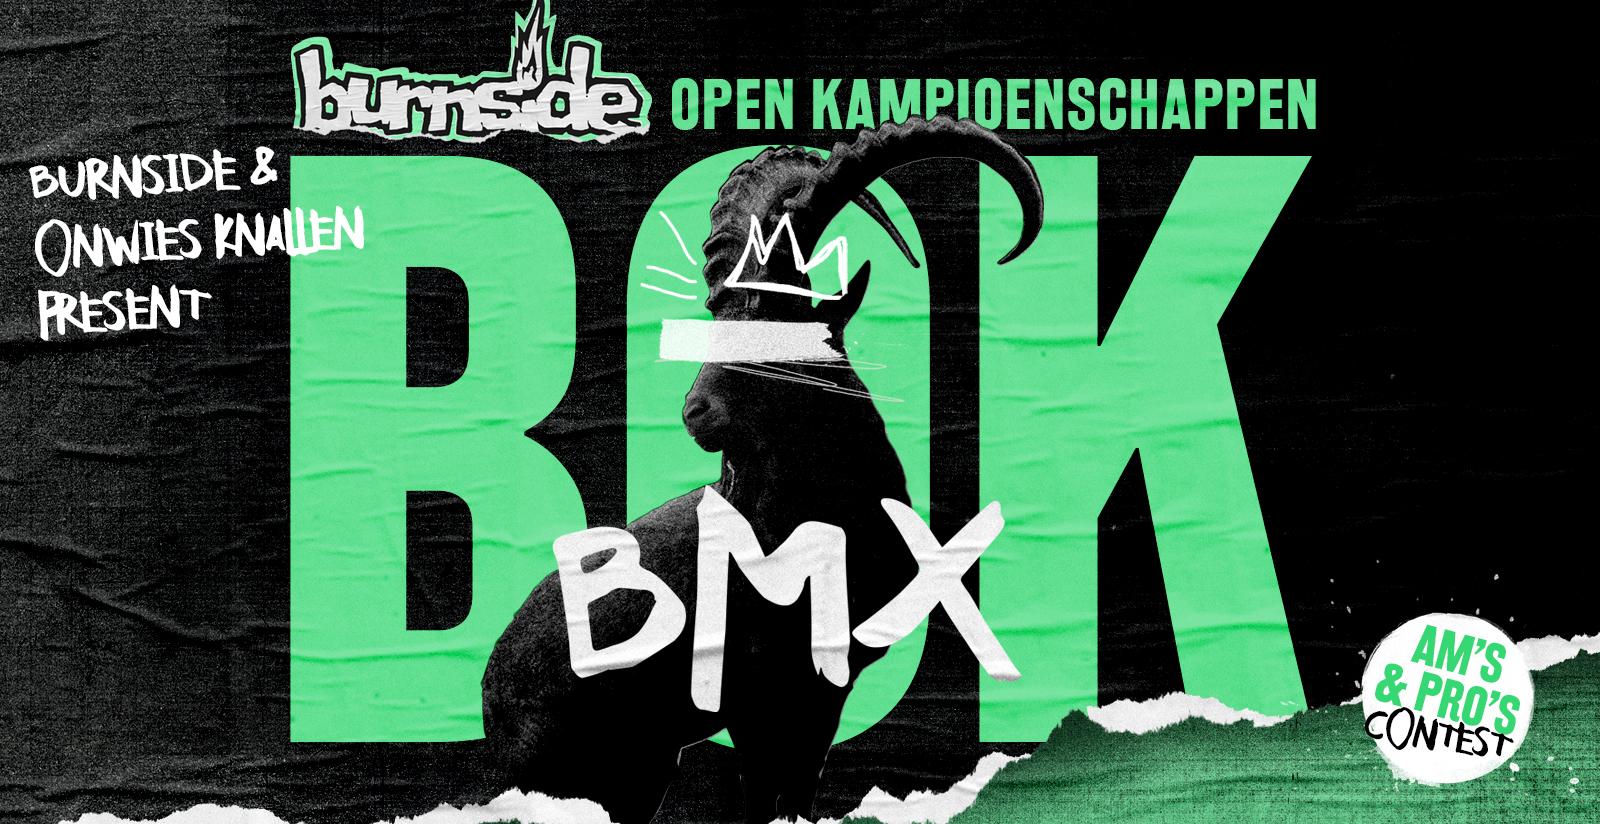 bok2018_bmx_fb_event.jpg